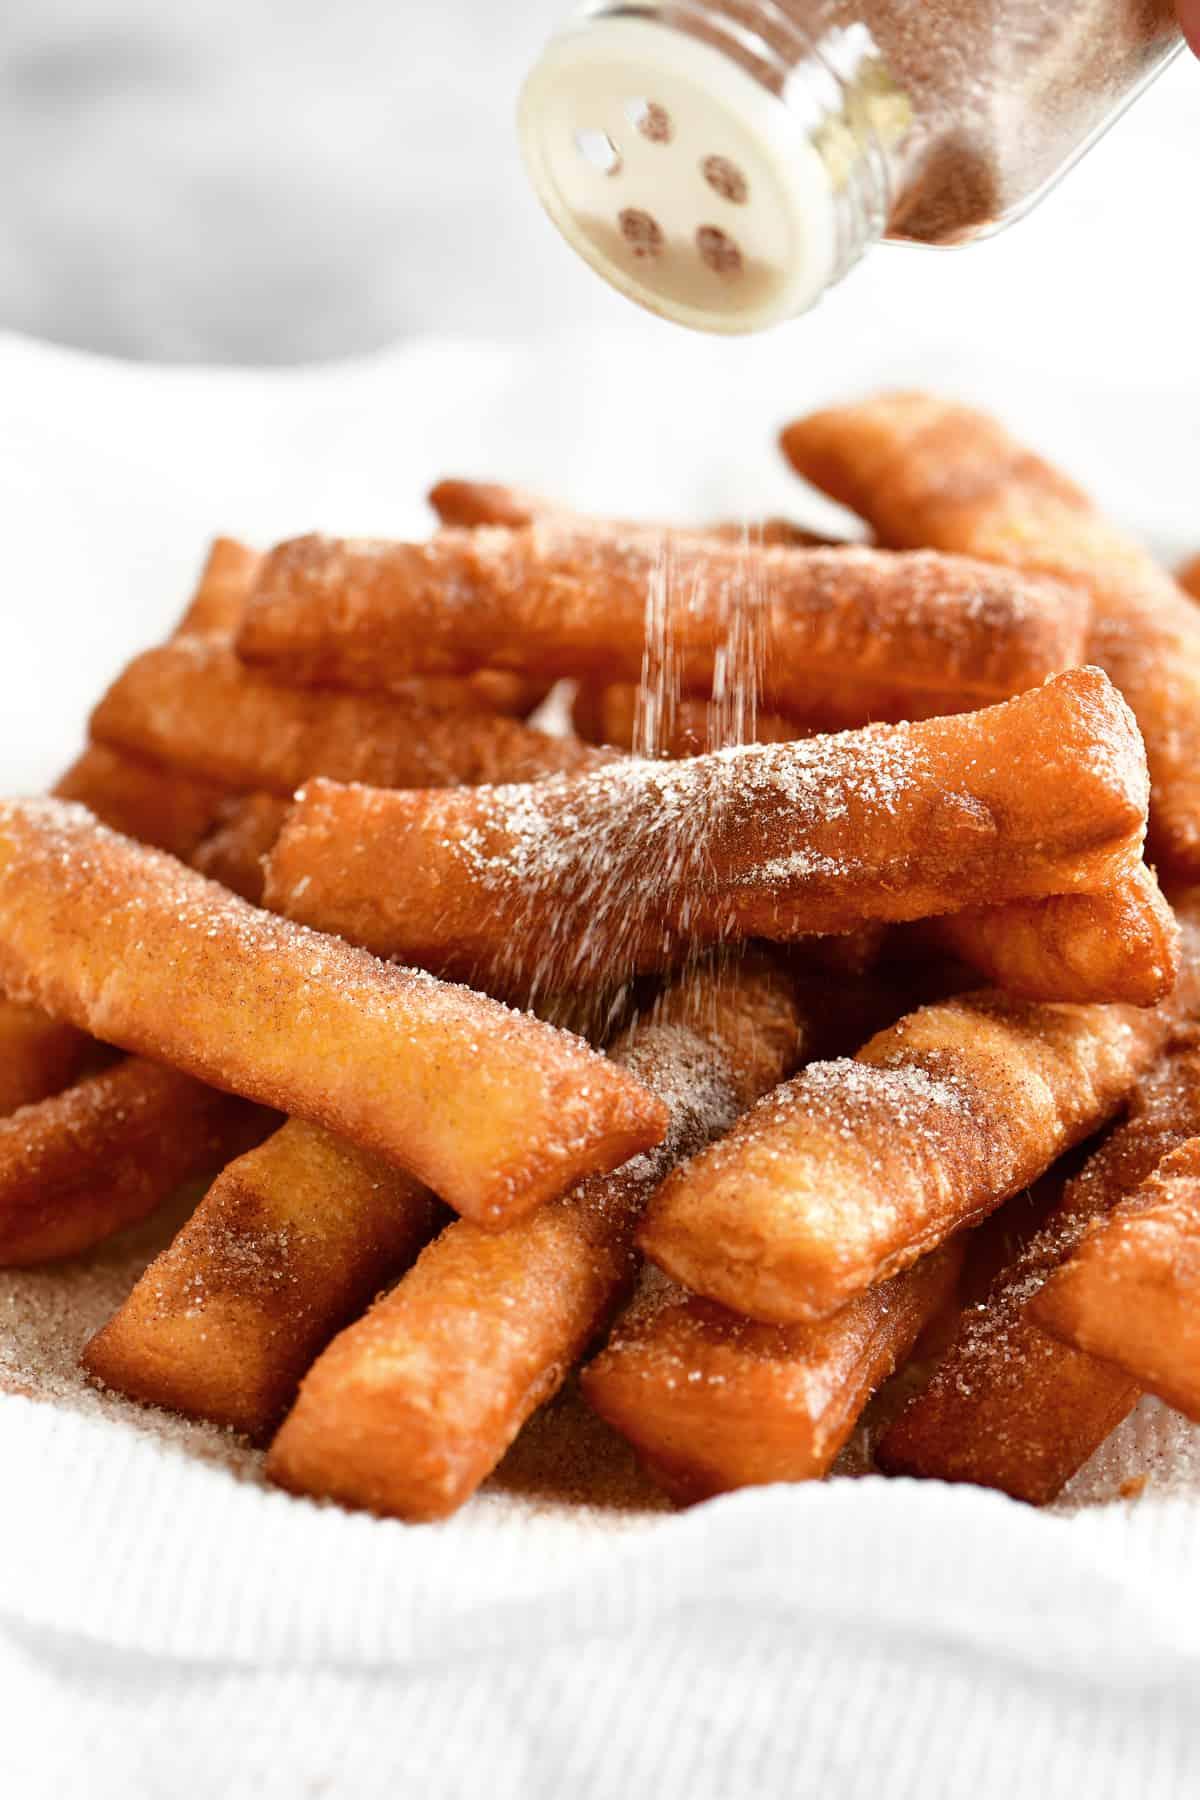 sprinkling cinnamon on the donut sticks